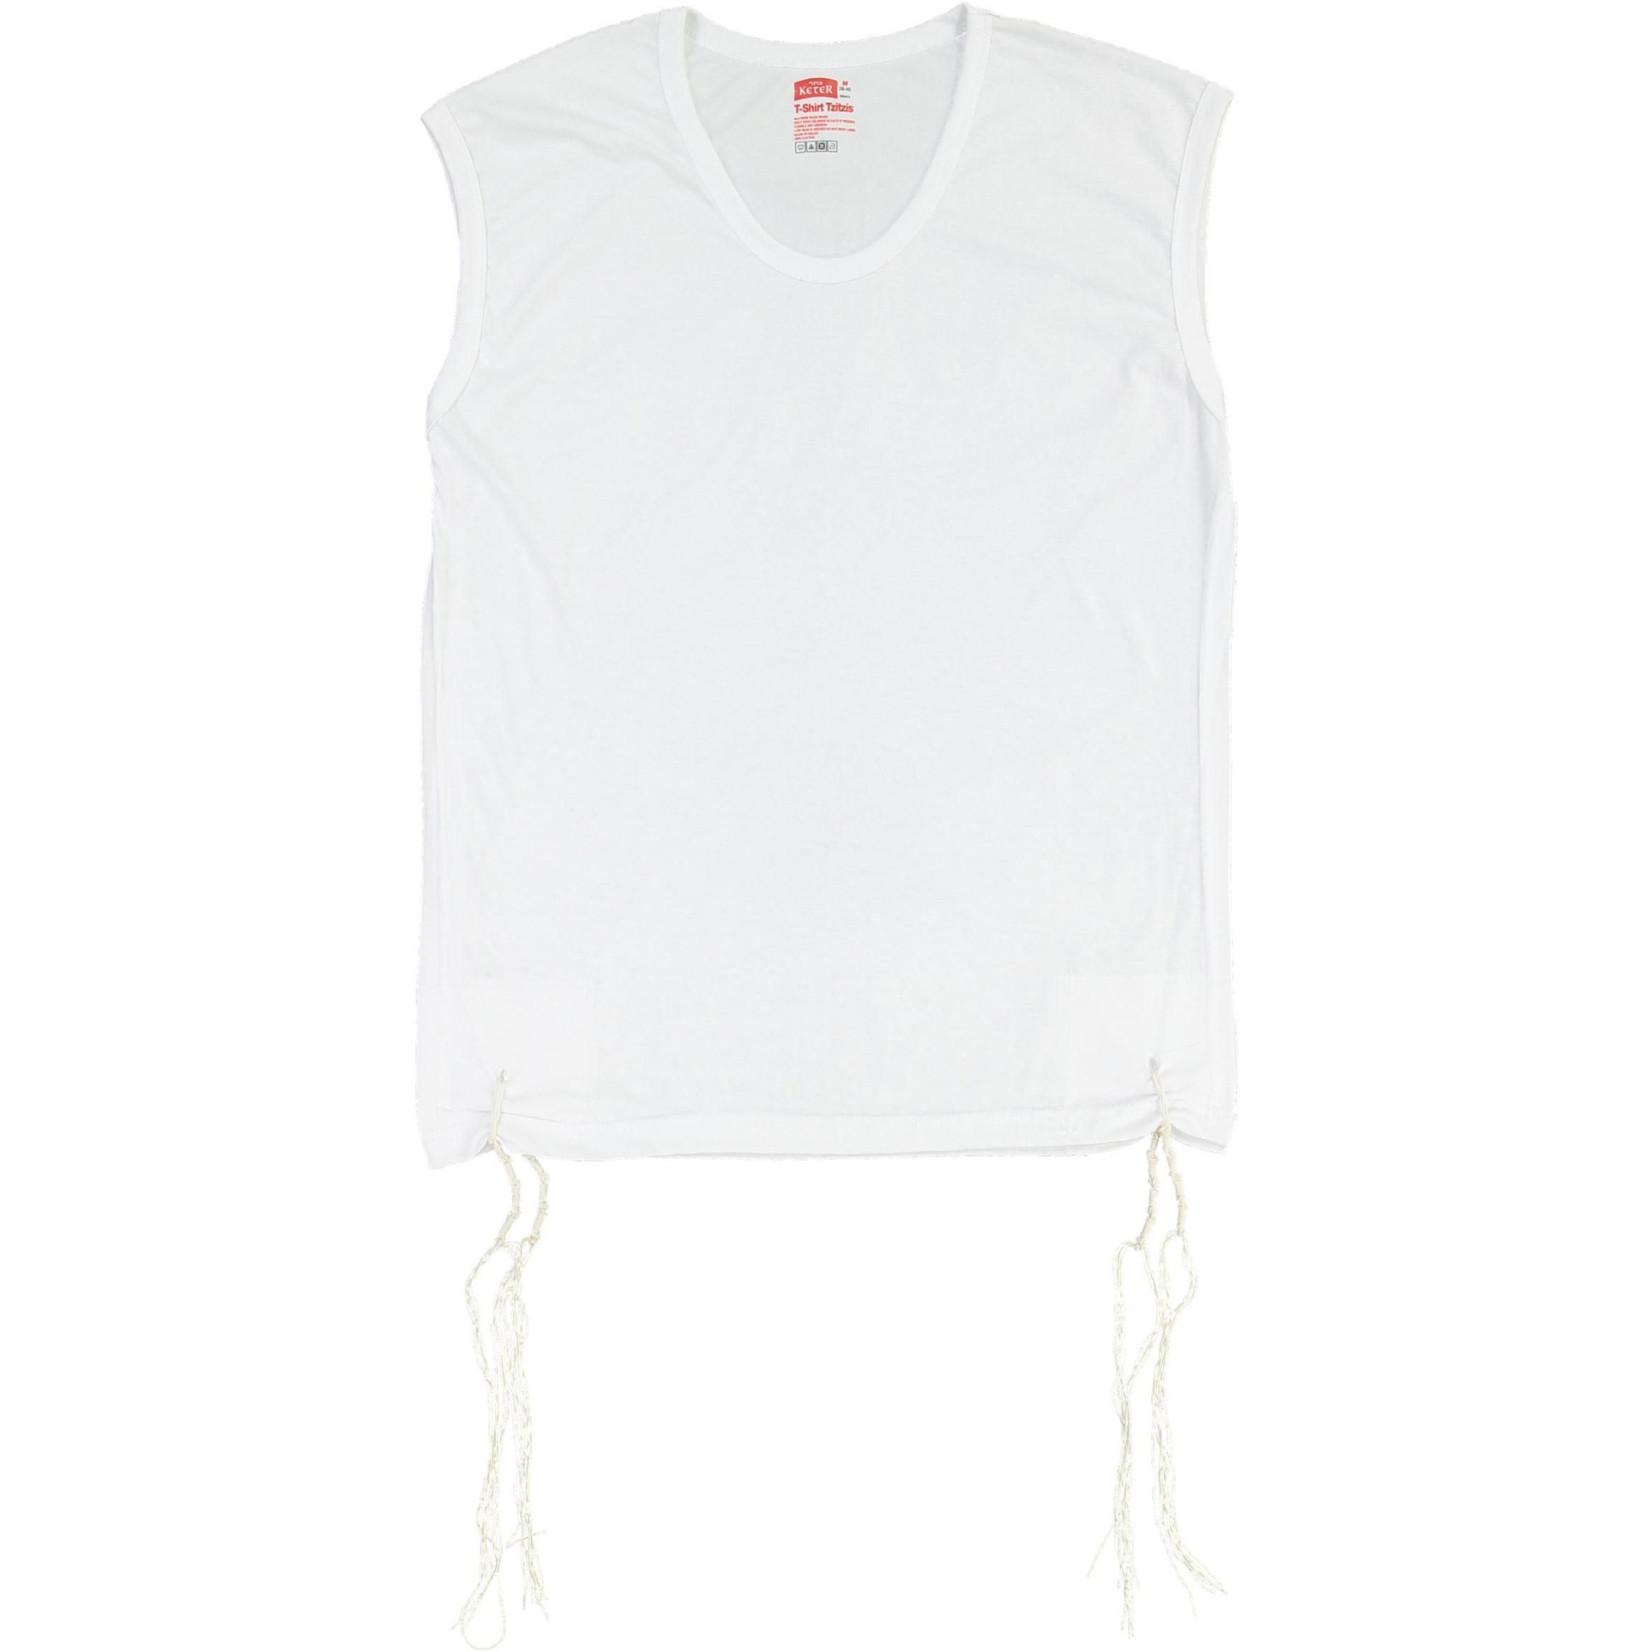 Undershirt-Style Arbah Kanfot, 100% Cotton, Round Neck, Size M